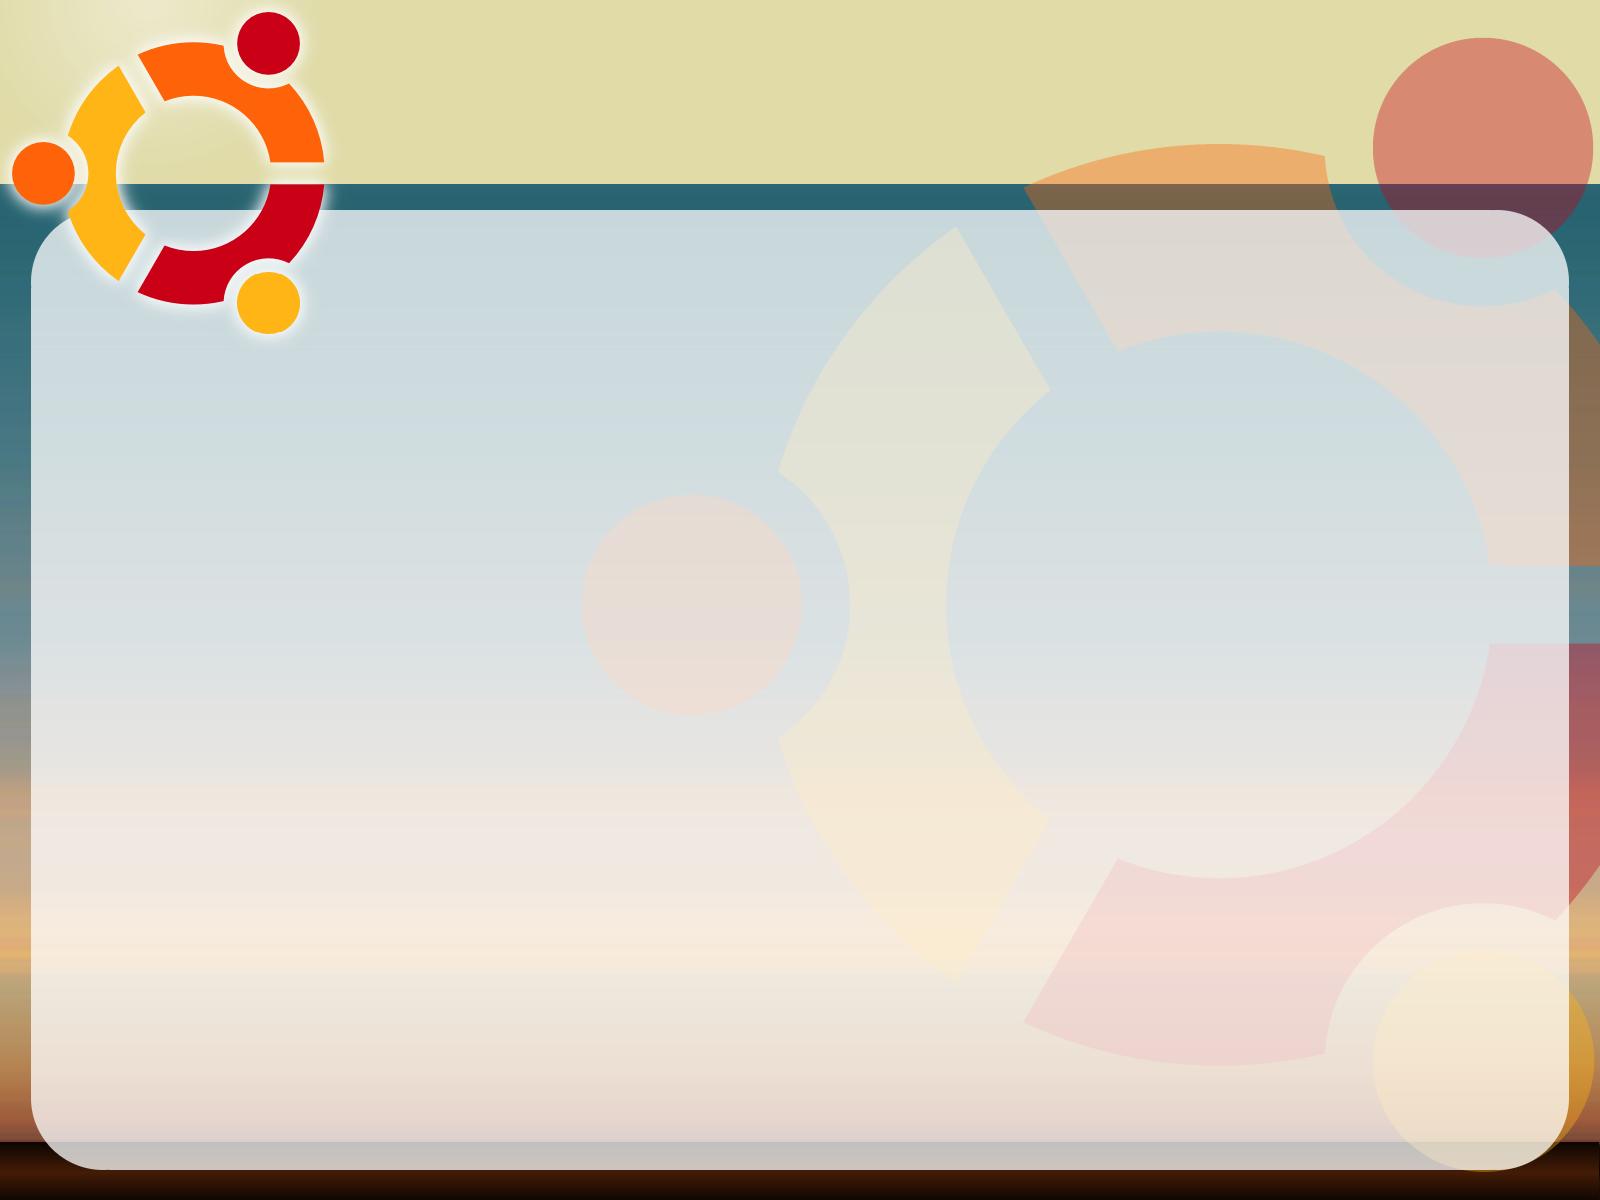 Wallpaper for powerpoint presentation